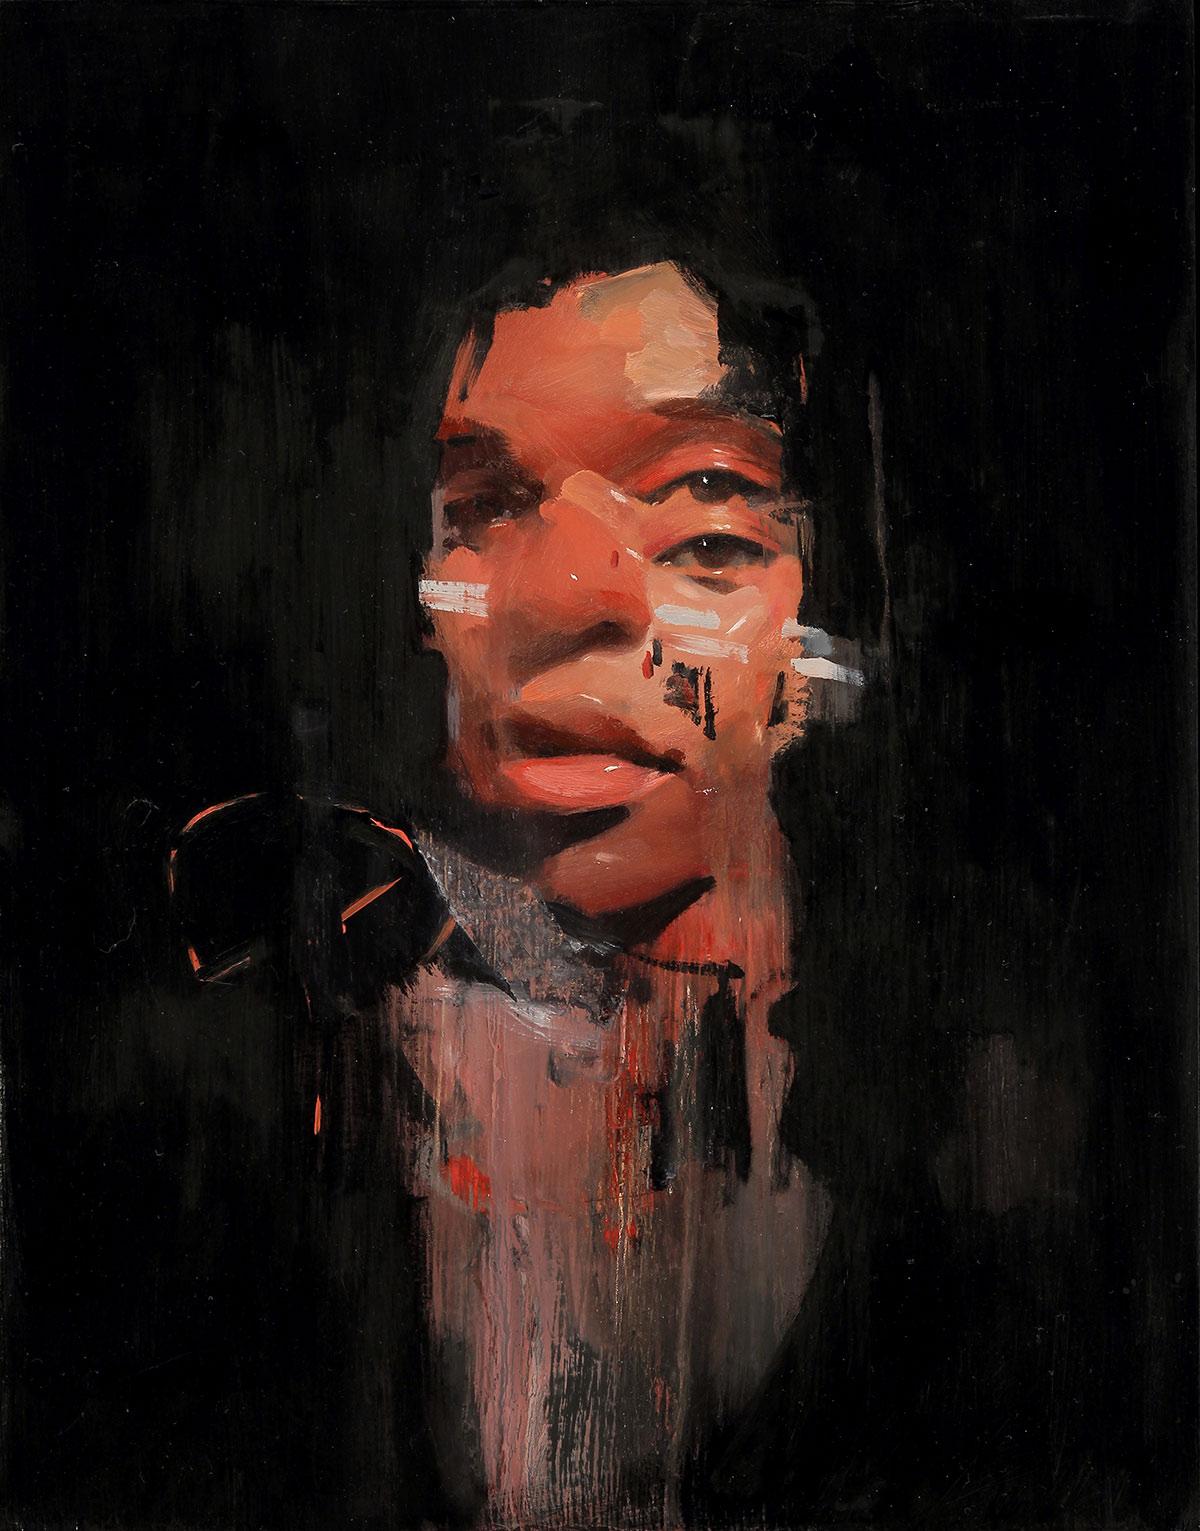 Emilio Villalba, Sangre, 11x14, oil on wood, 2017